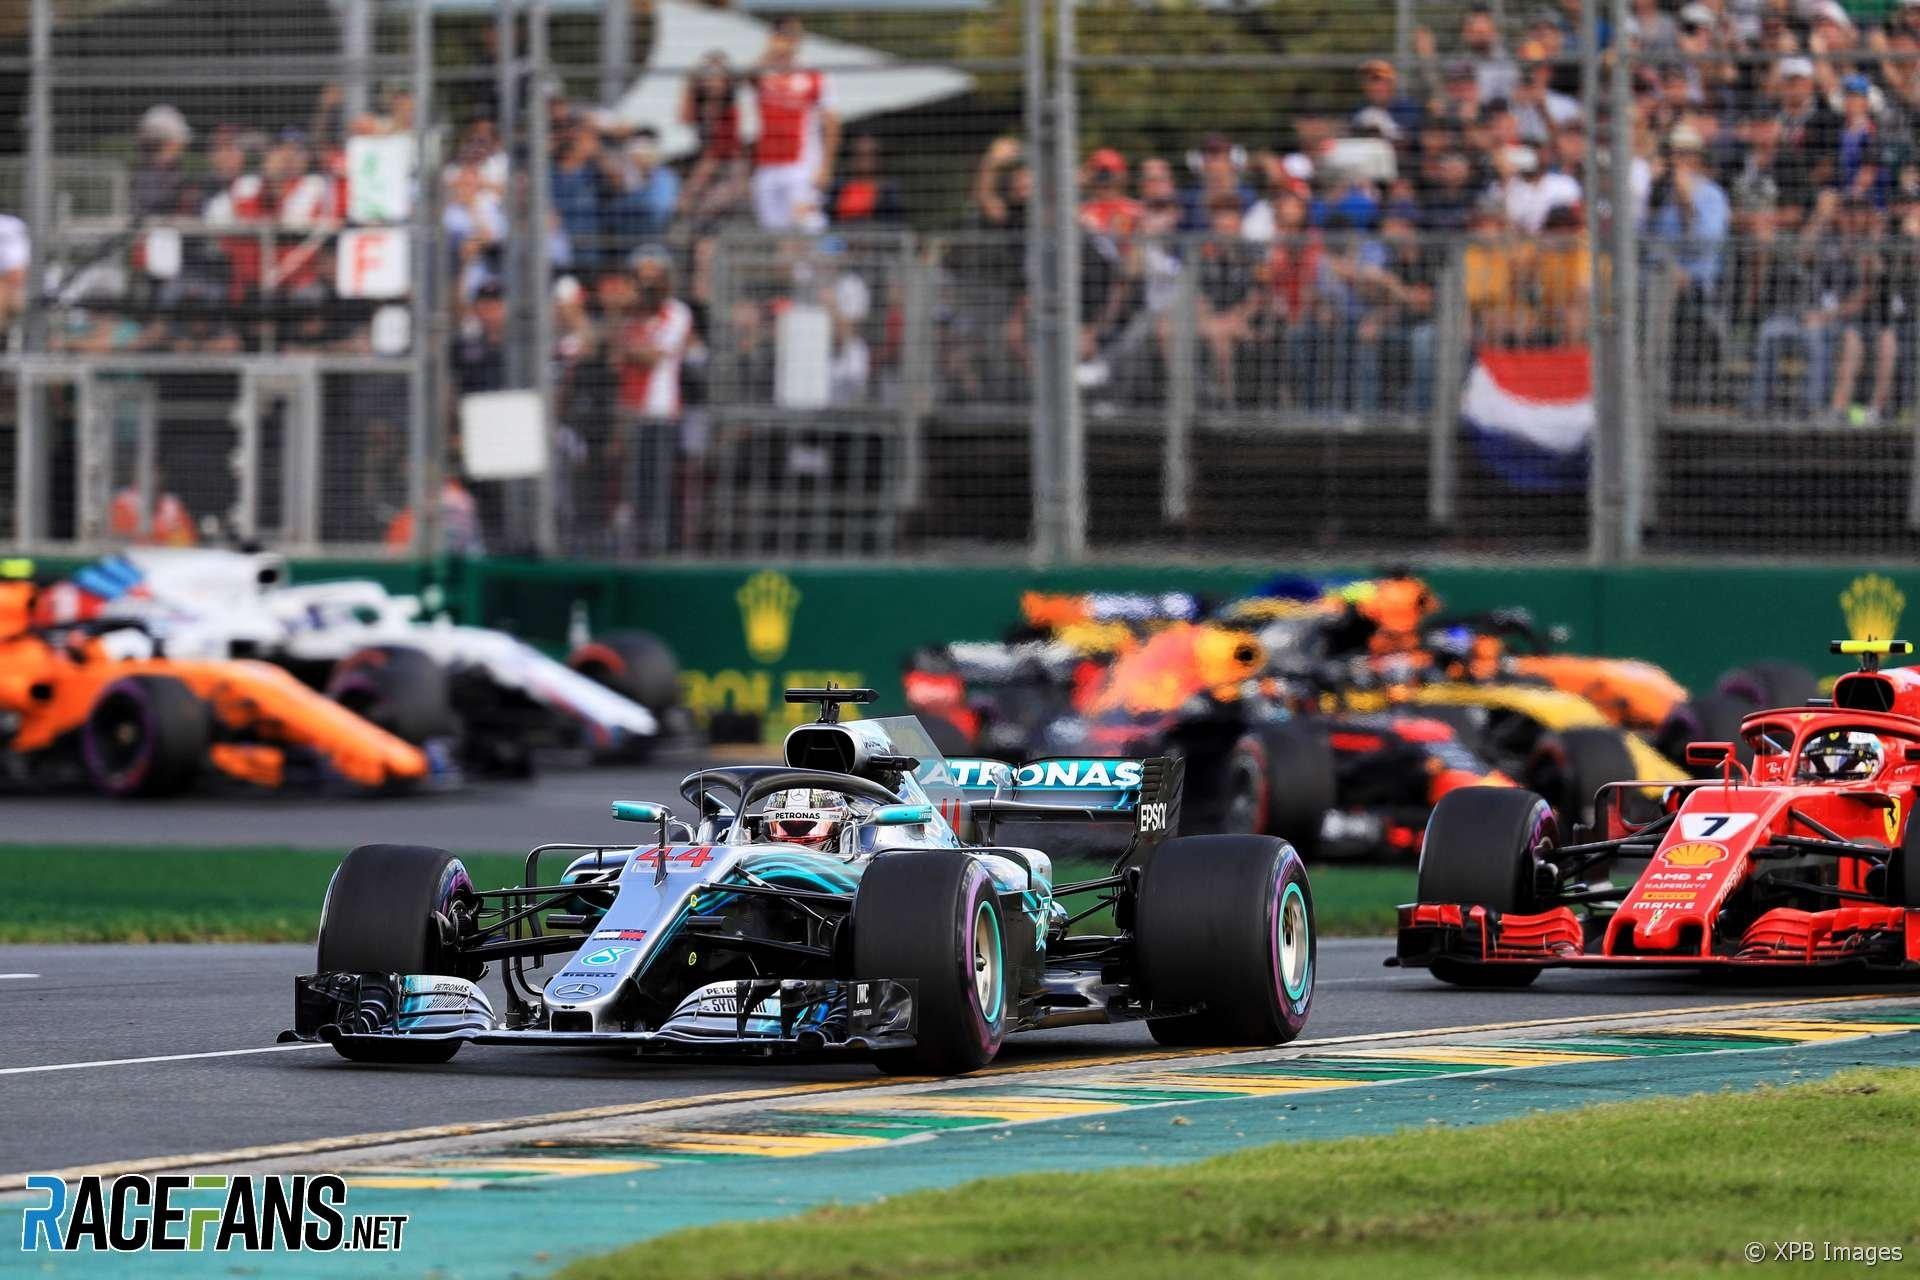 F1 Calendarracefans: Get The Current Formula 1 Race Schedule Formula E Calendar 2019 Download